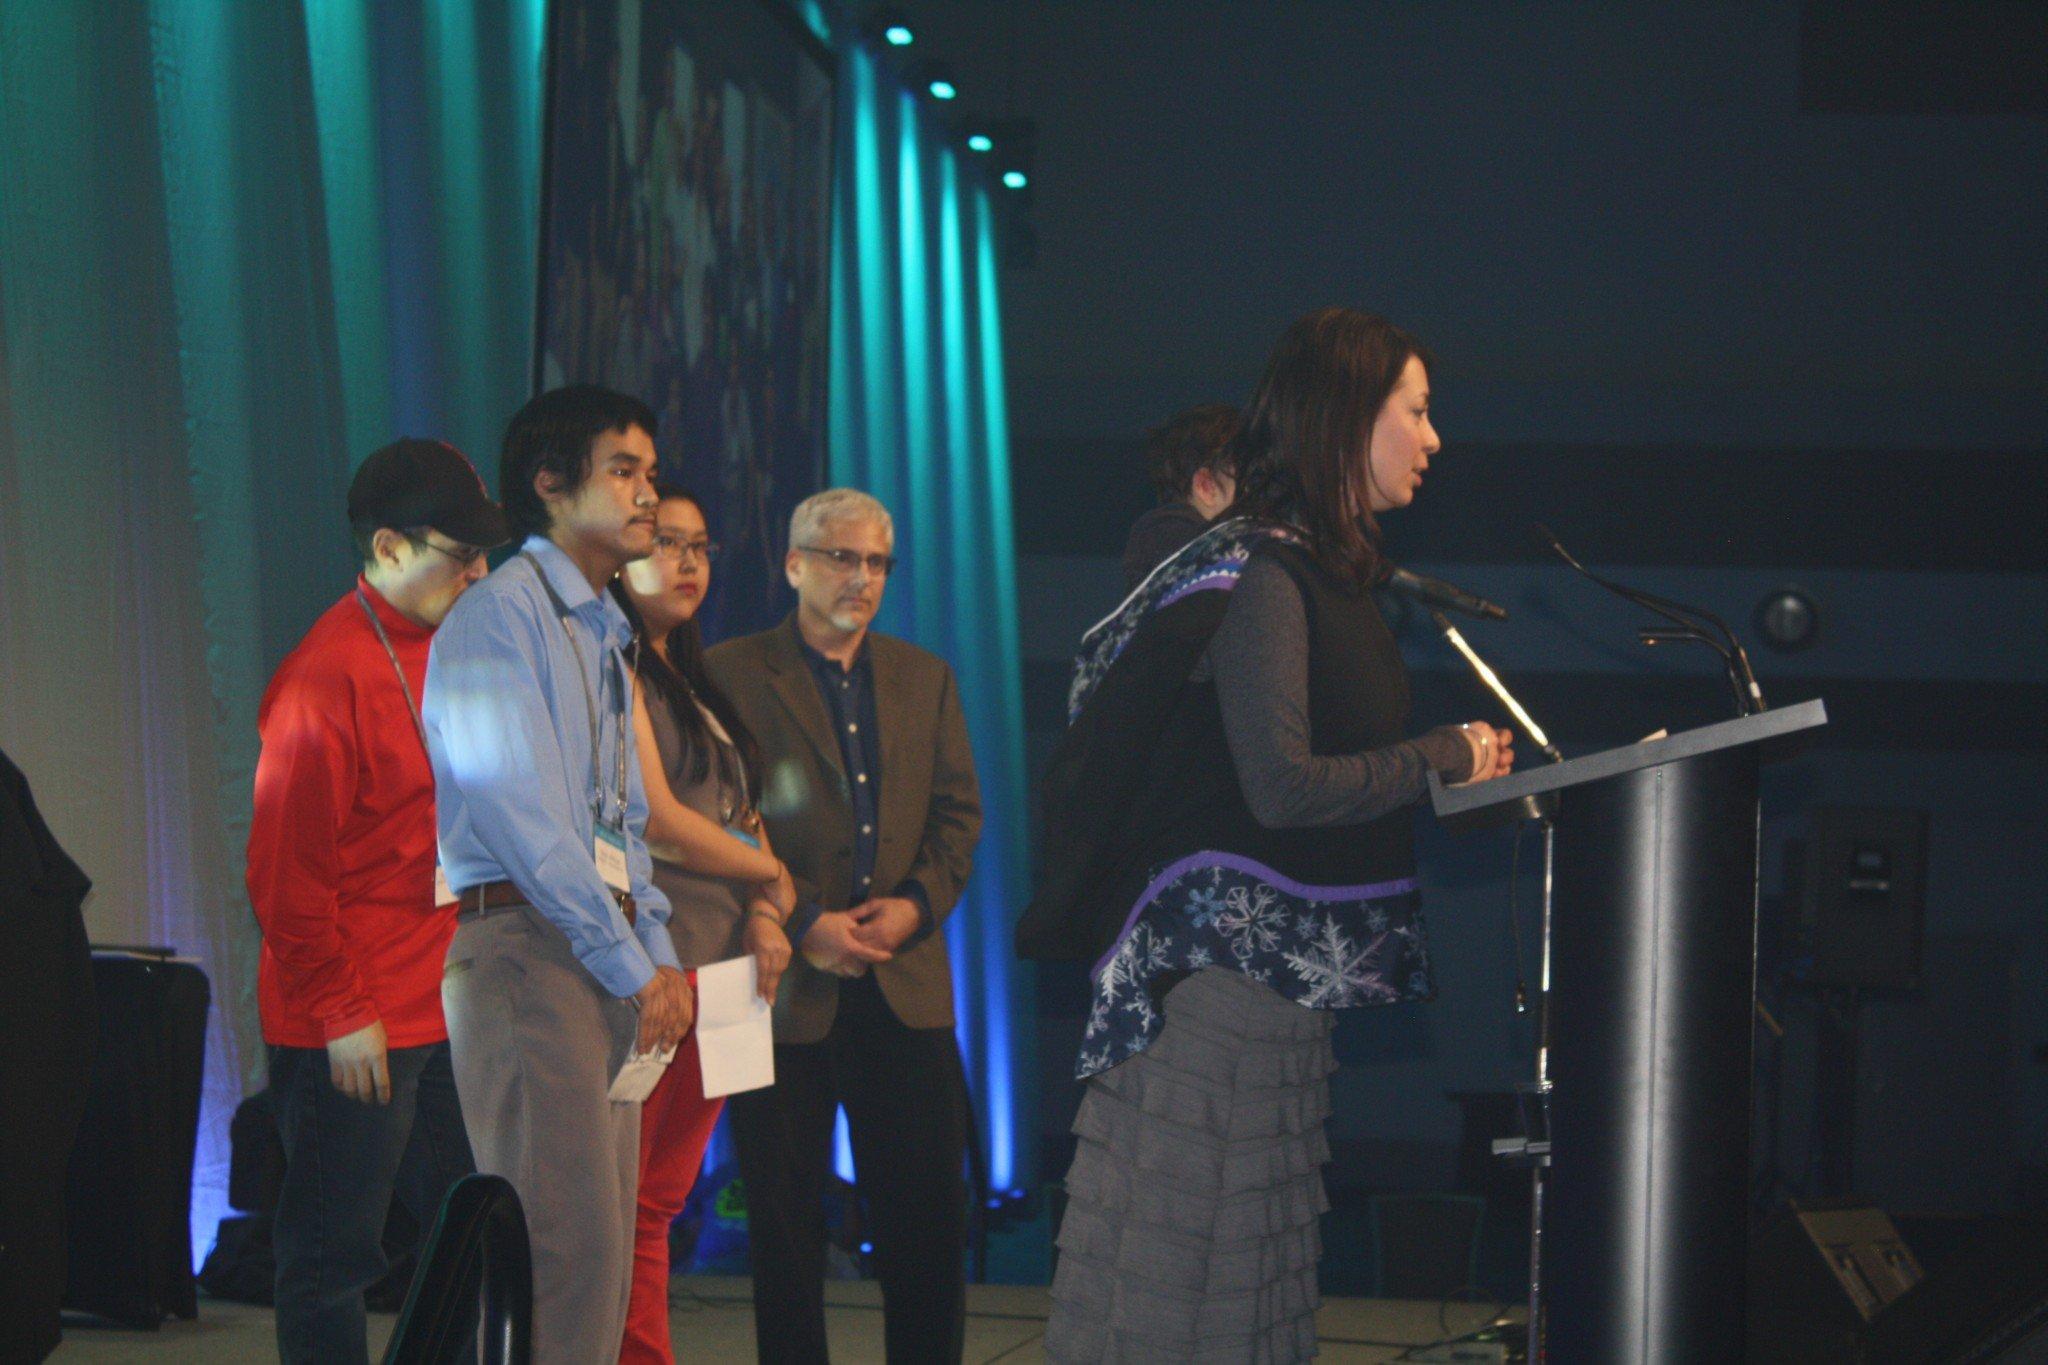 ArcticNet Annual Scientific Meeting: Call for Nominations